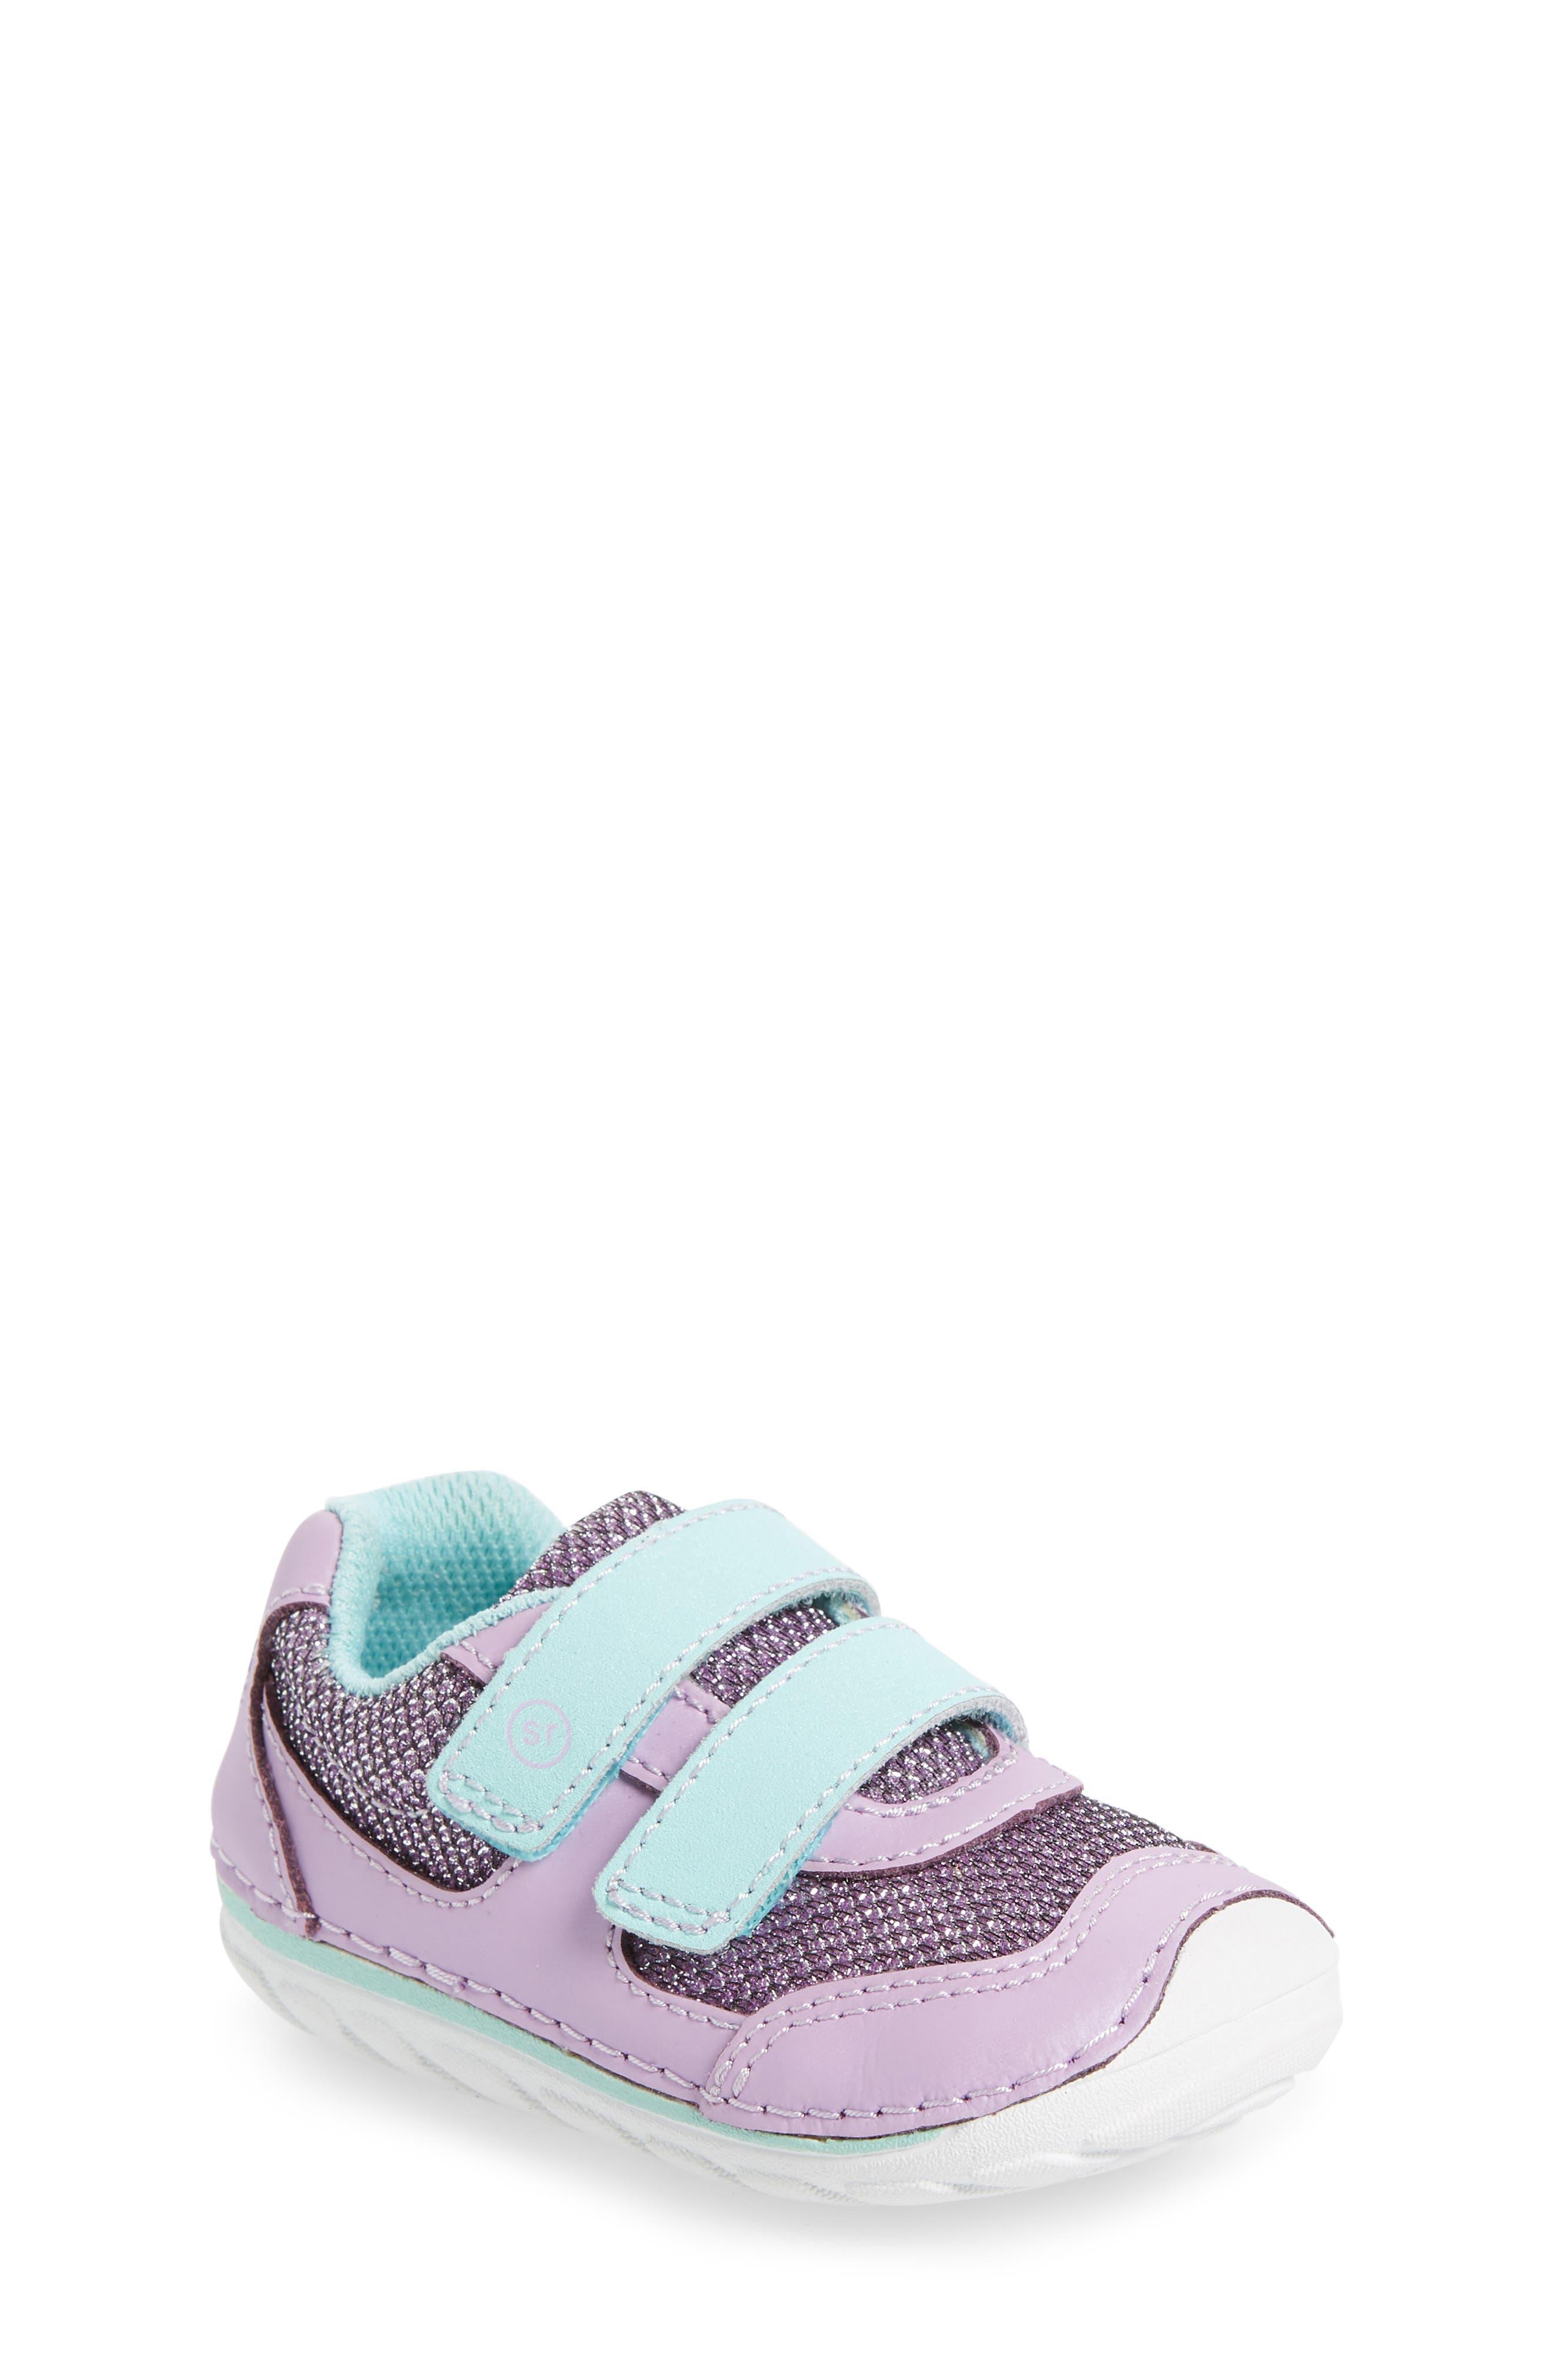 Stride Rite Kids Charlotte Water Shoe Charlotte K